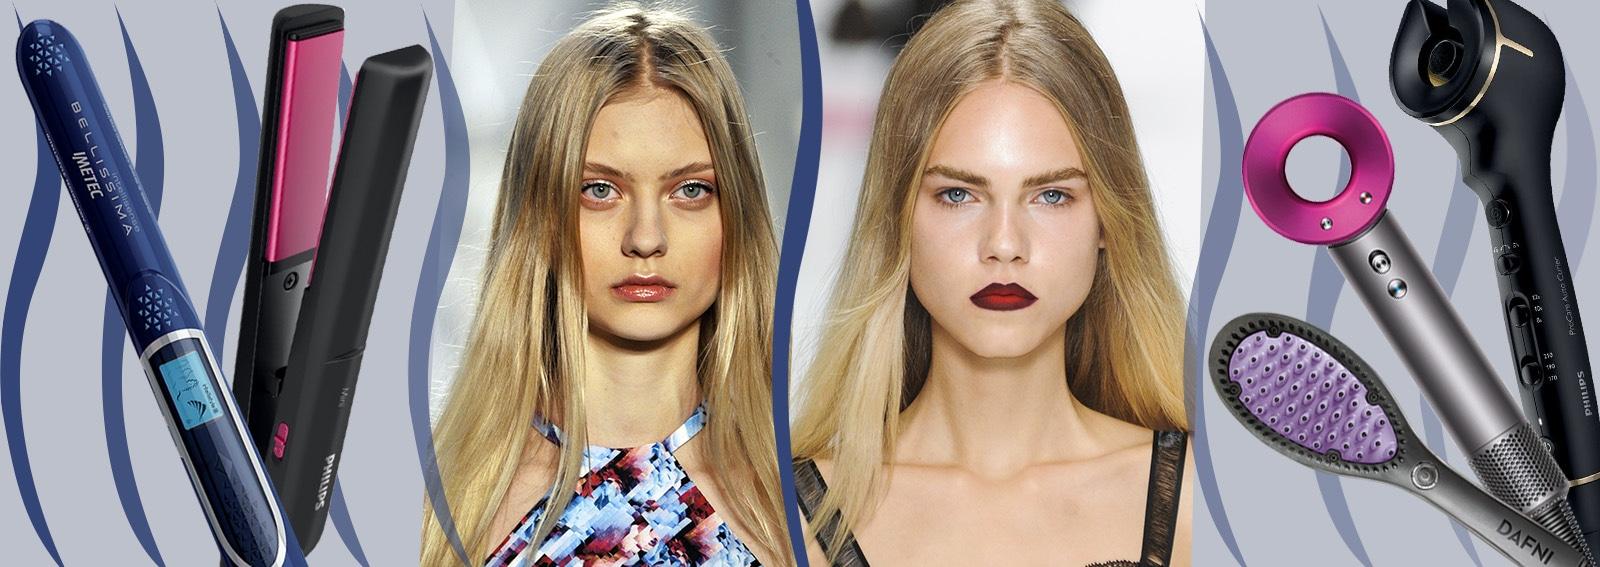 cover-styler-per-capelli-lisci-desktop